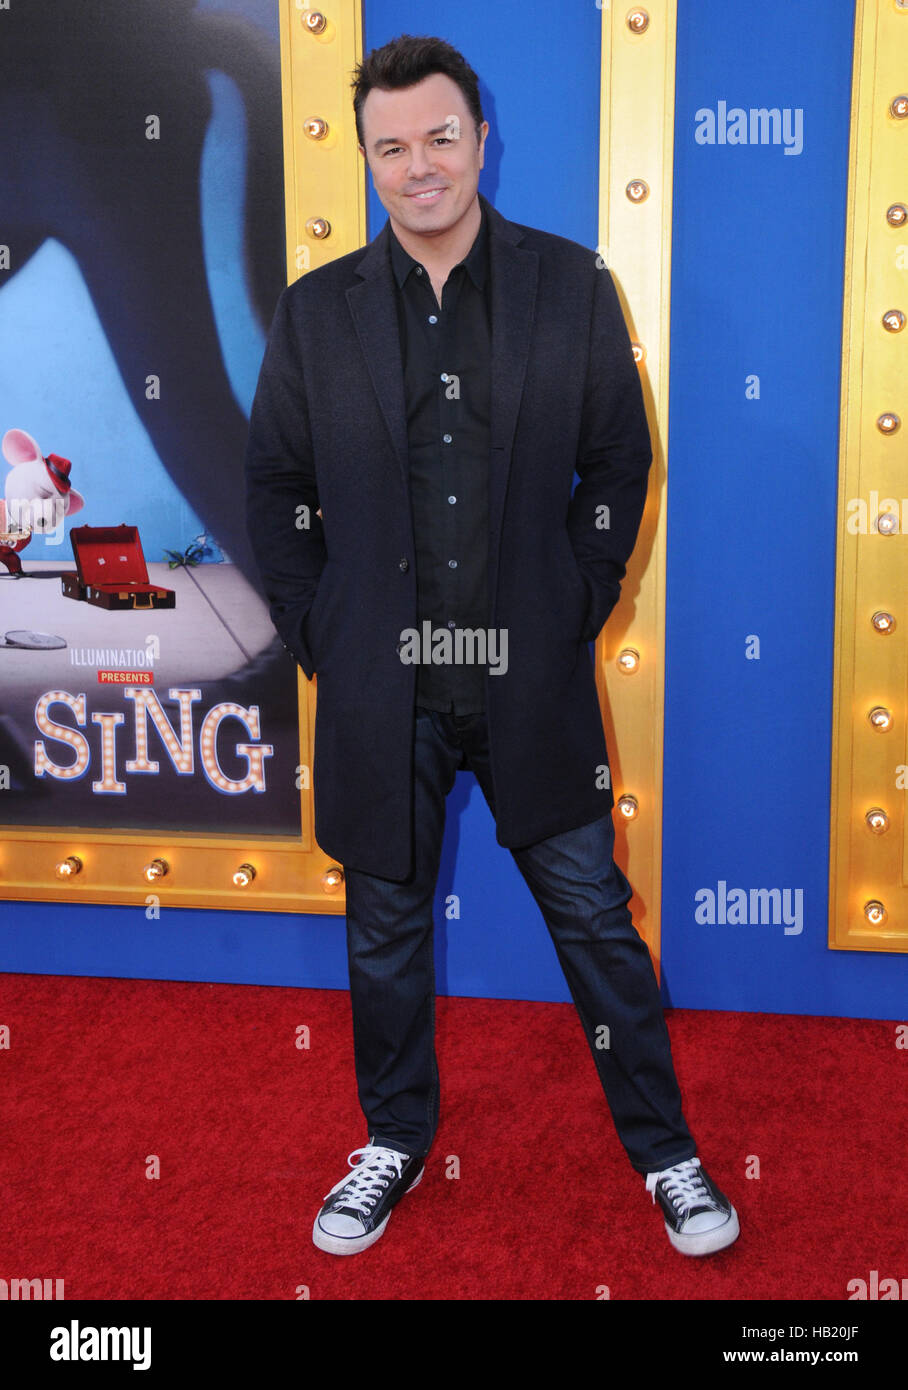 Los Angeles, CA, EE.UU. 3 dic, 2016. 03 de diciembre de 2016 - Beverly Hills, California. Seth MacFarlane. Estreno Imagen De Stock